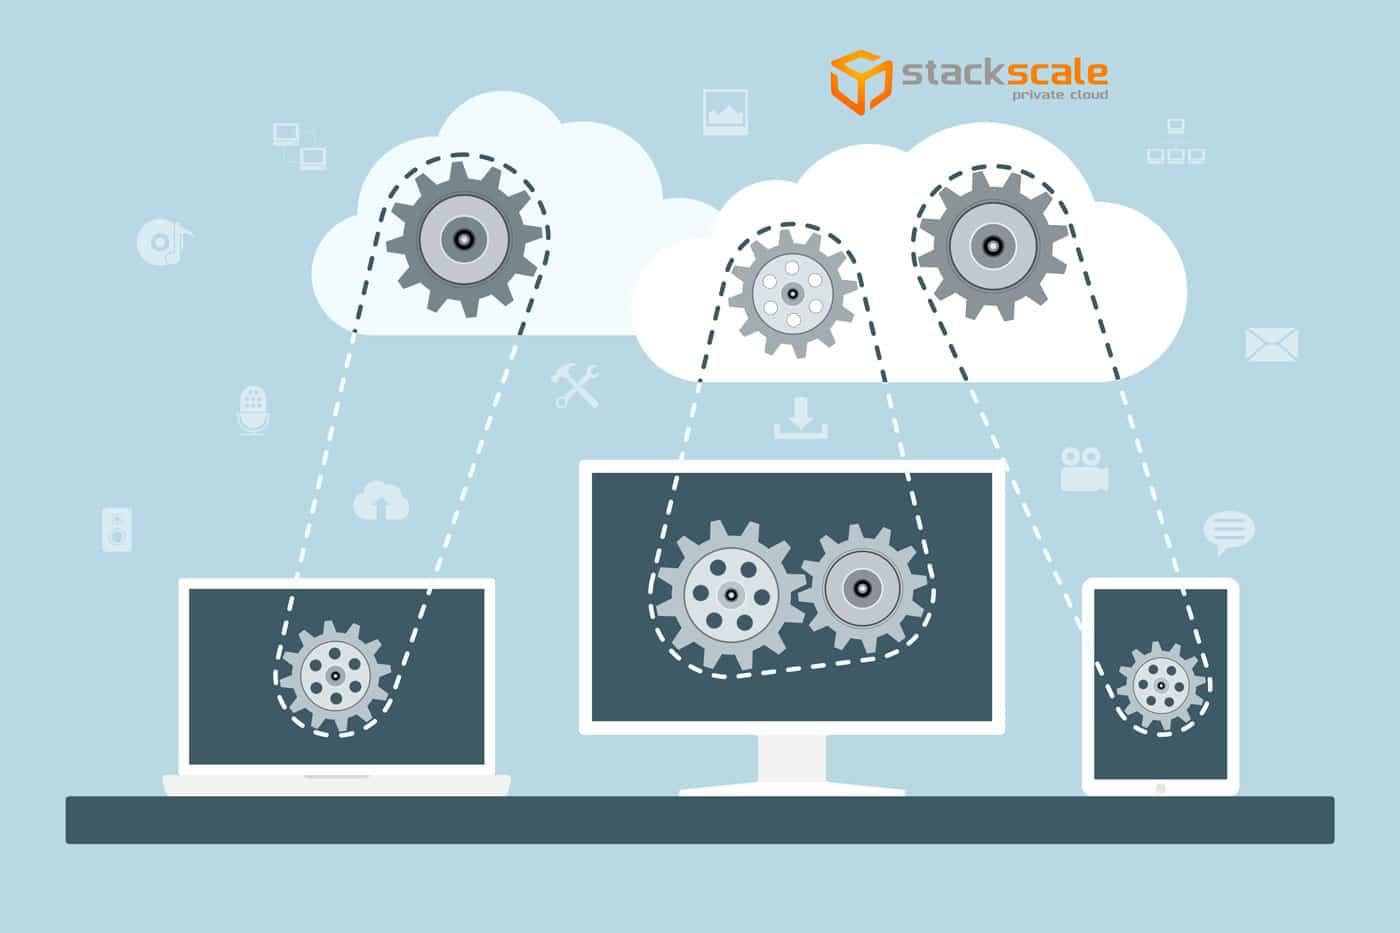 cloud-computing-stackscale